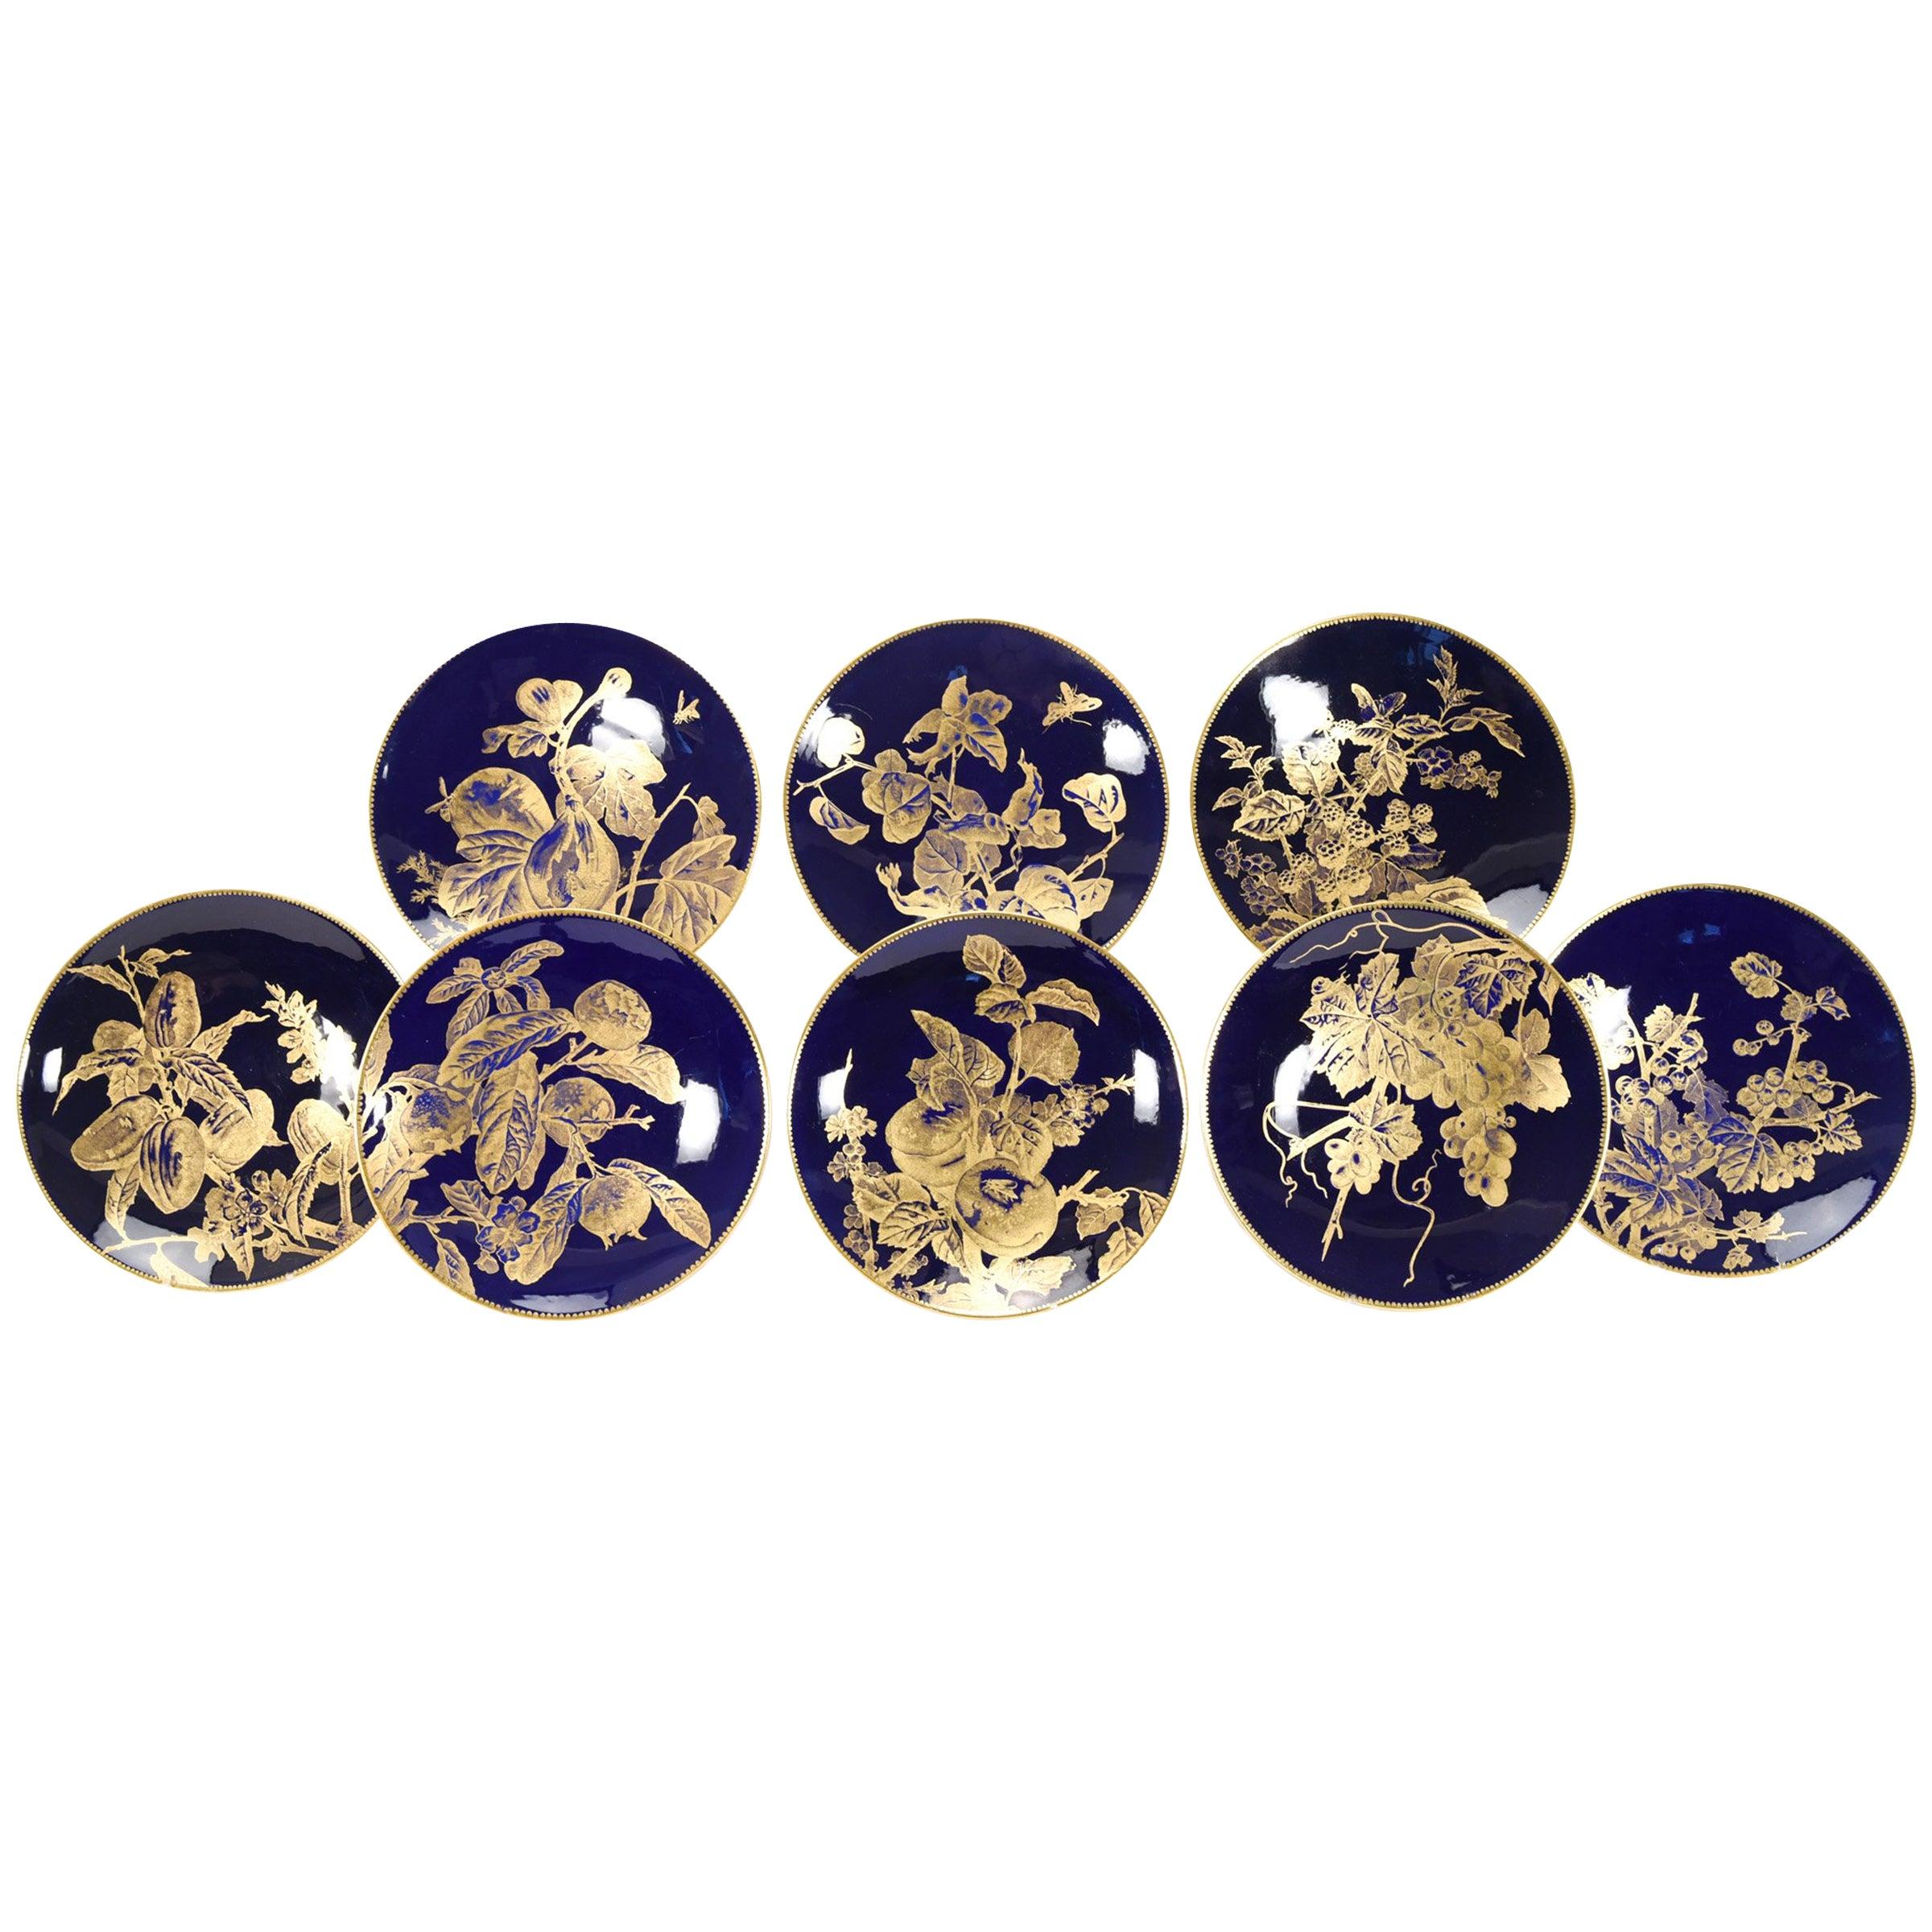 12 Brownfield Aesthetic Movement Cobalt Blue Gold Fruit Dessert Plates